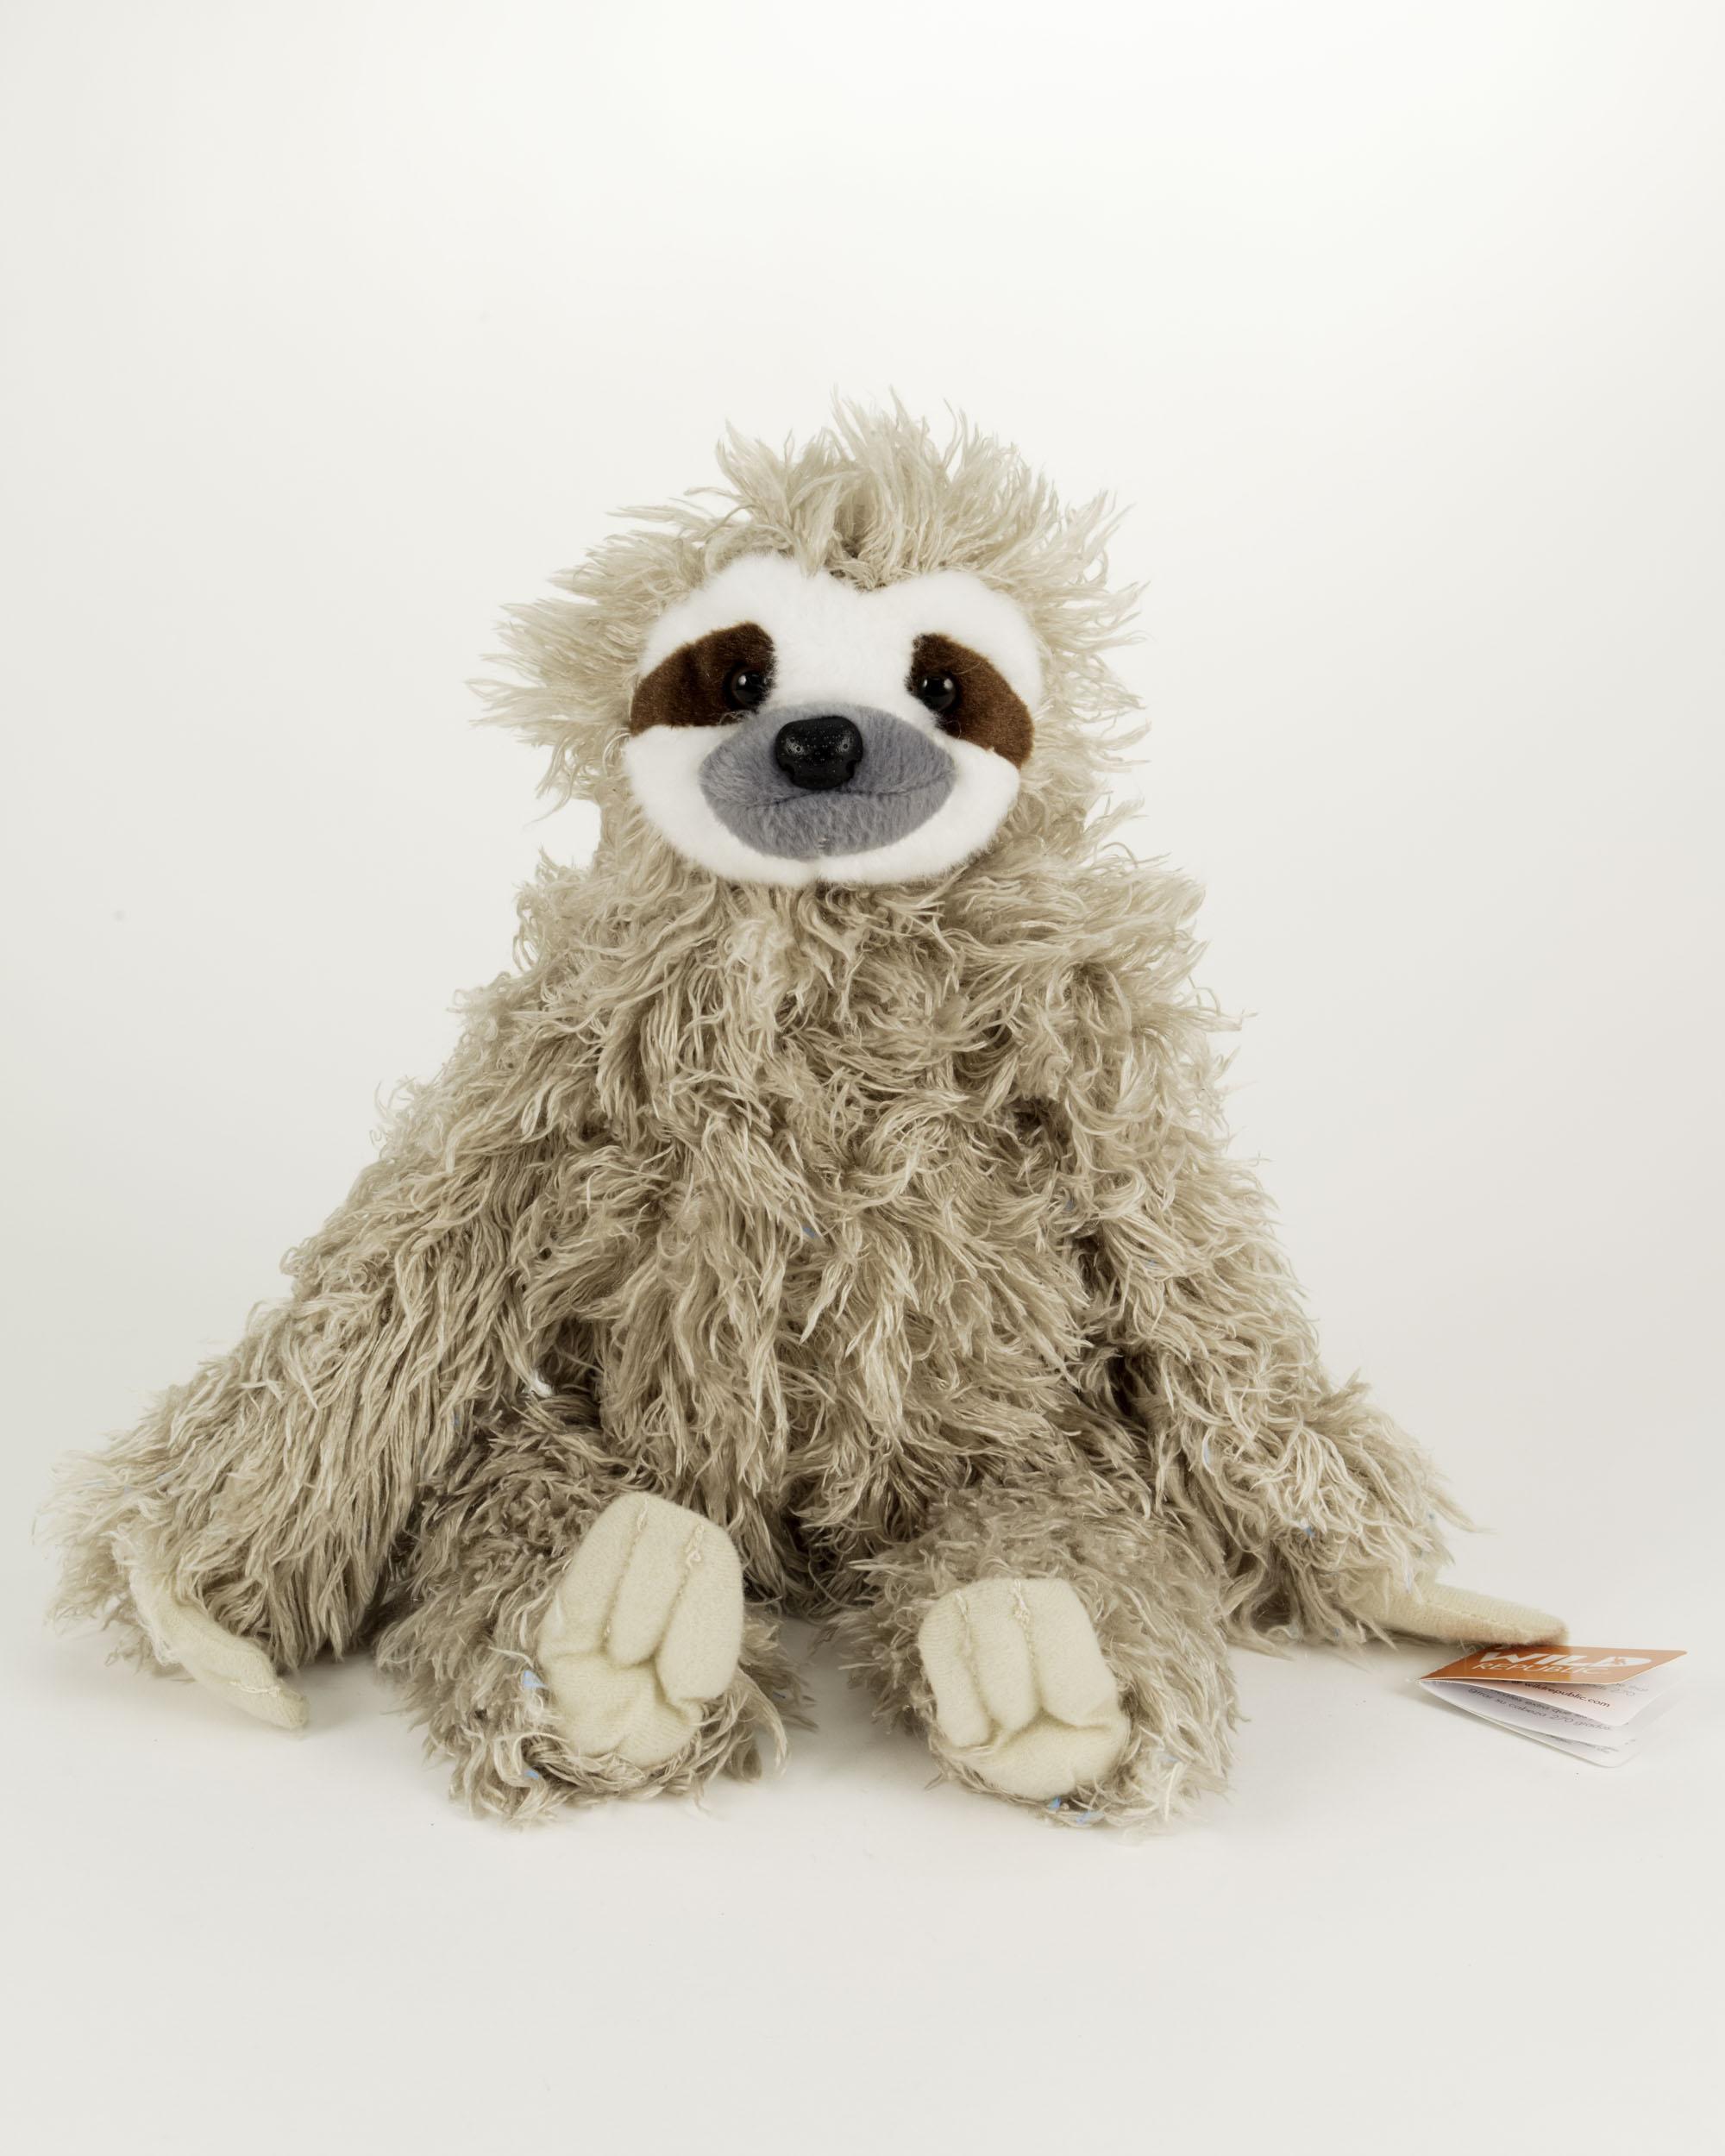 Sloth Plush,12257